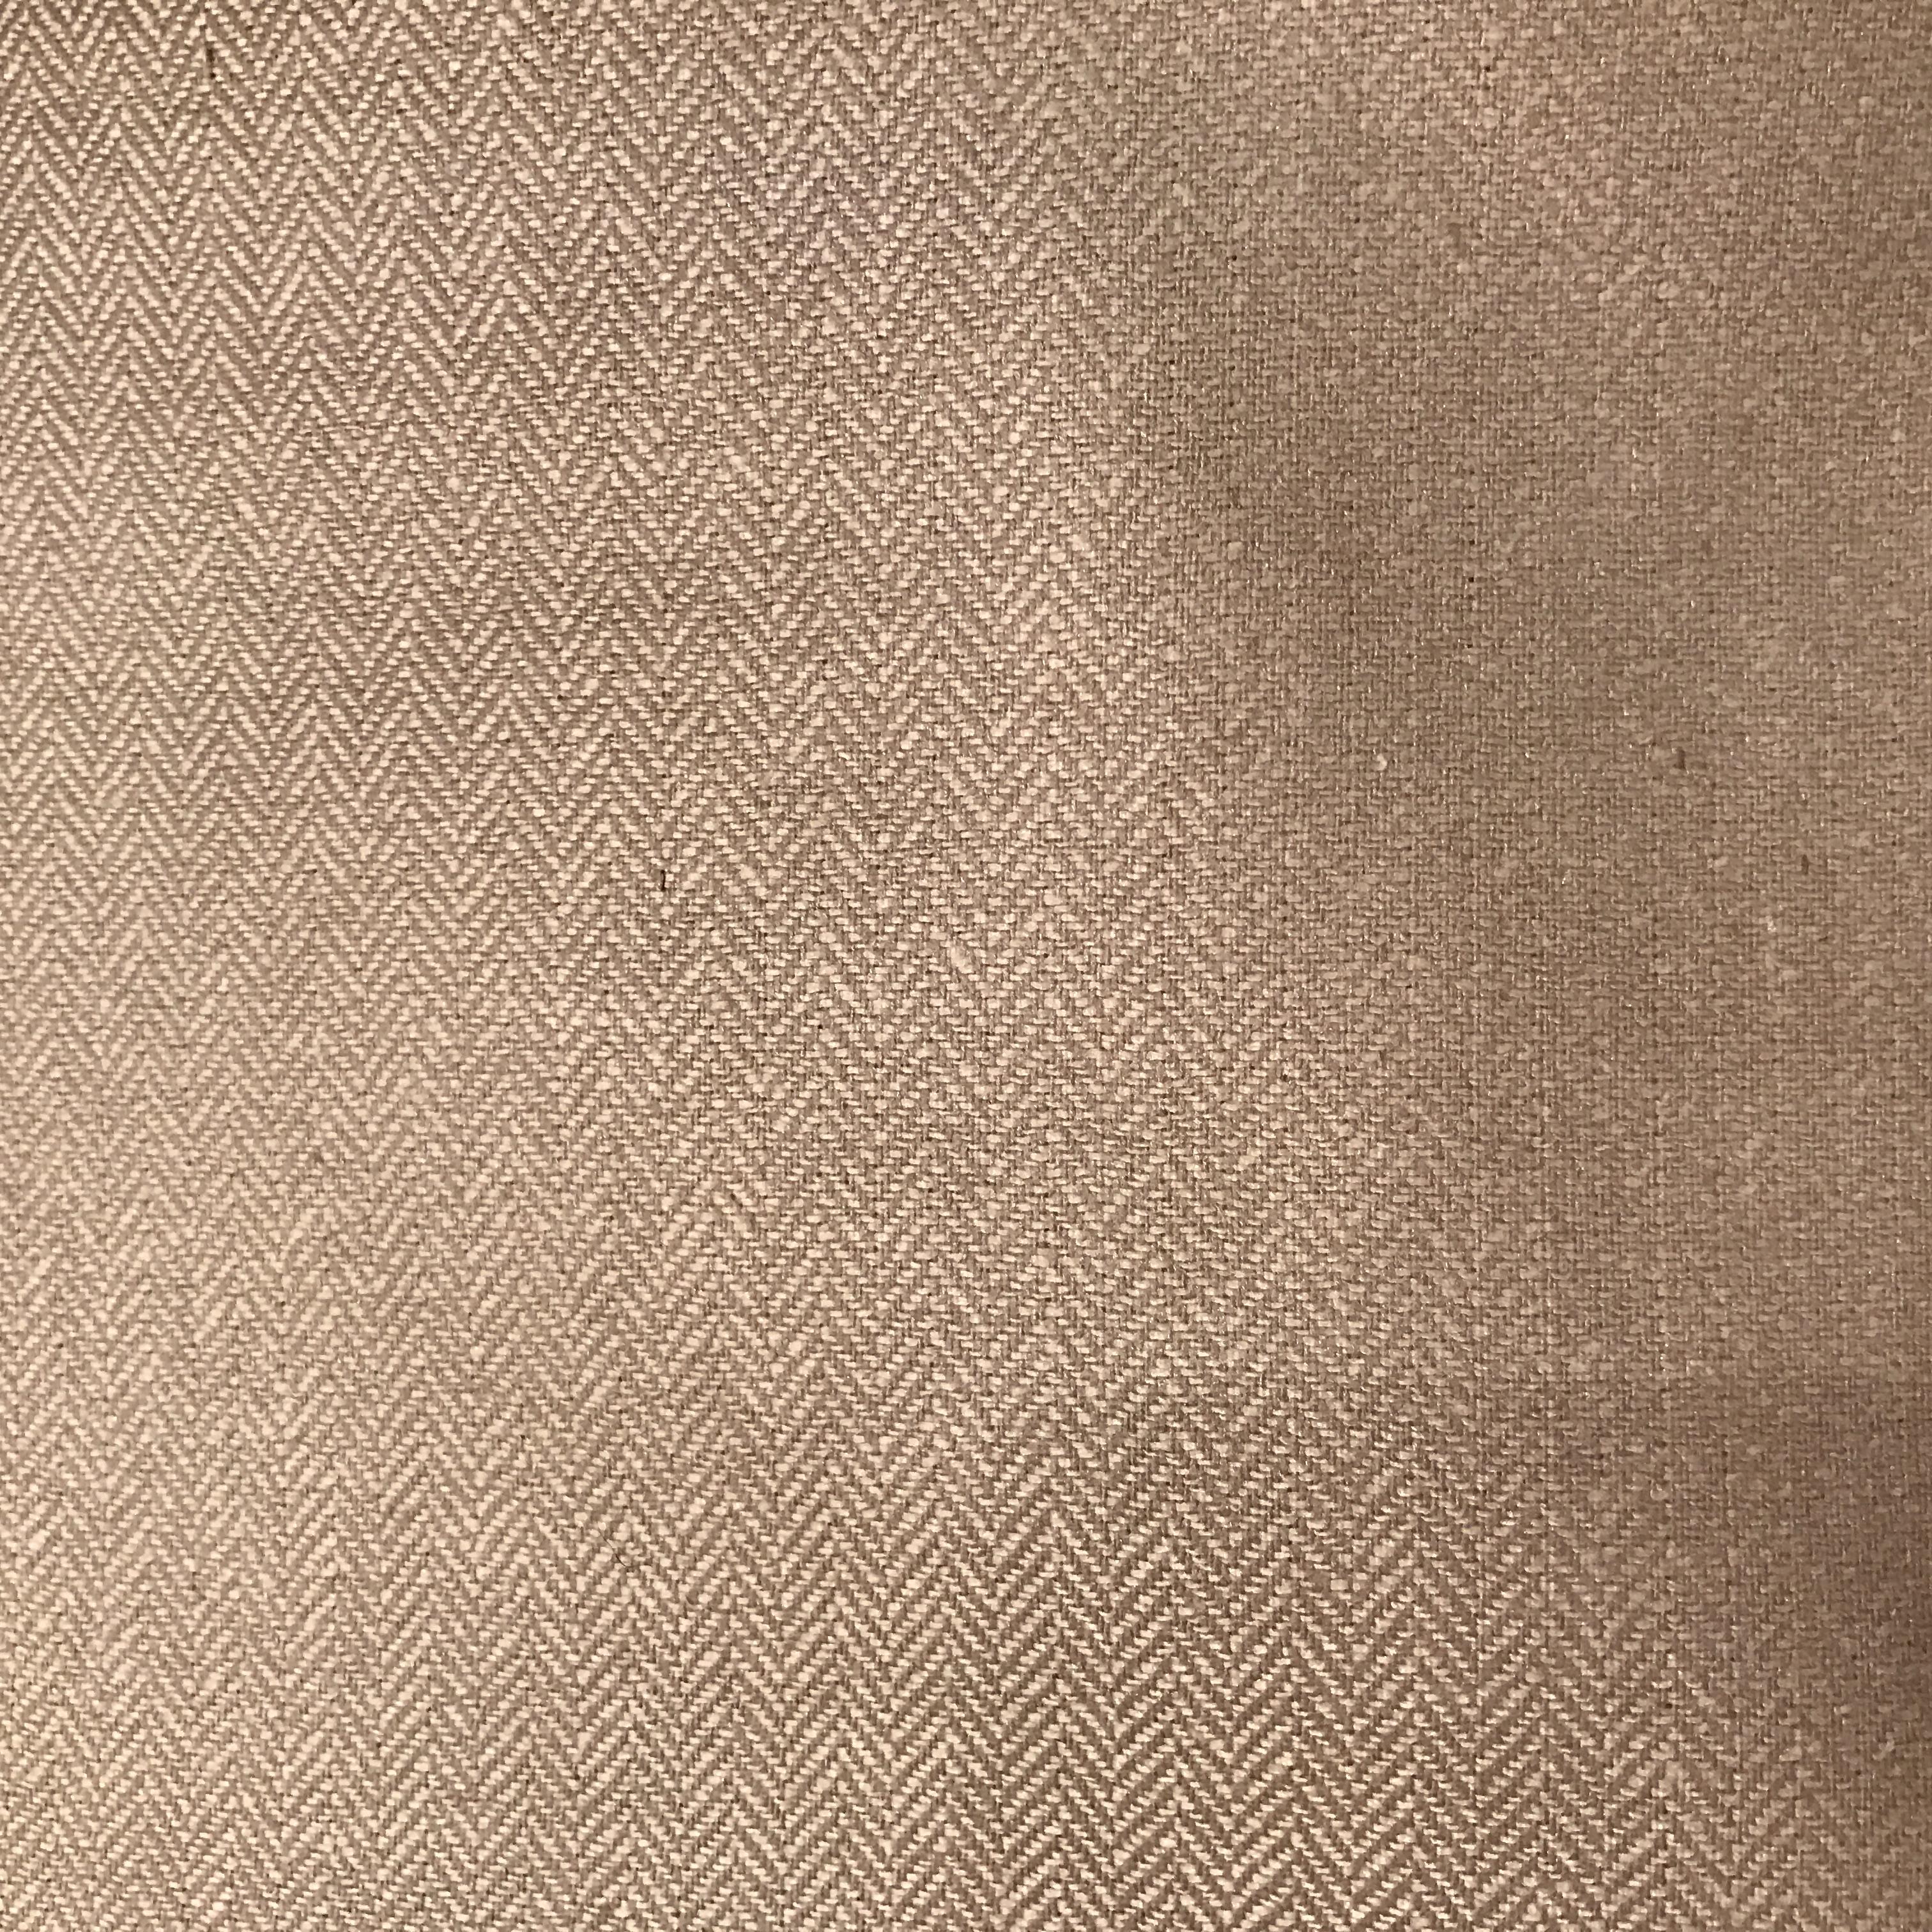 Yellowish-beige twill (silk + linen?) Simply Fabrics